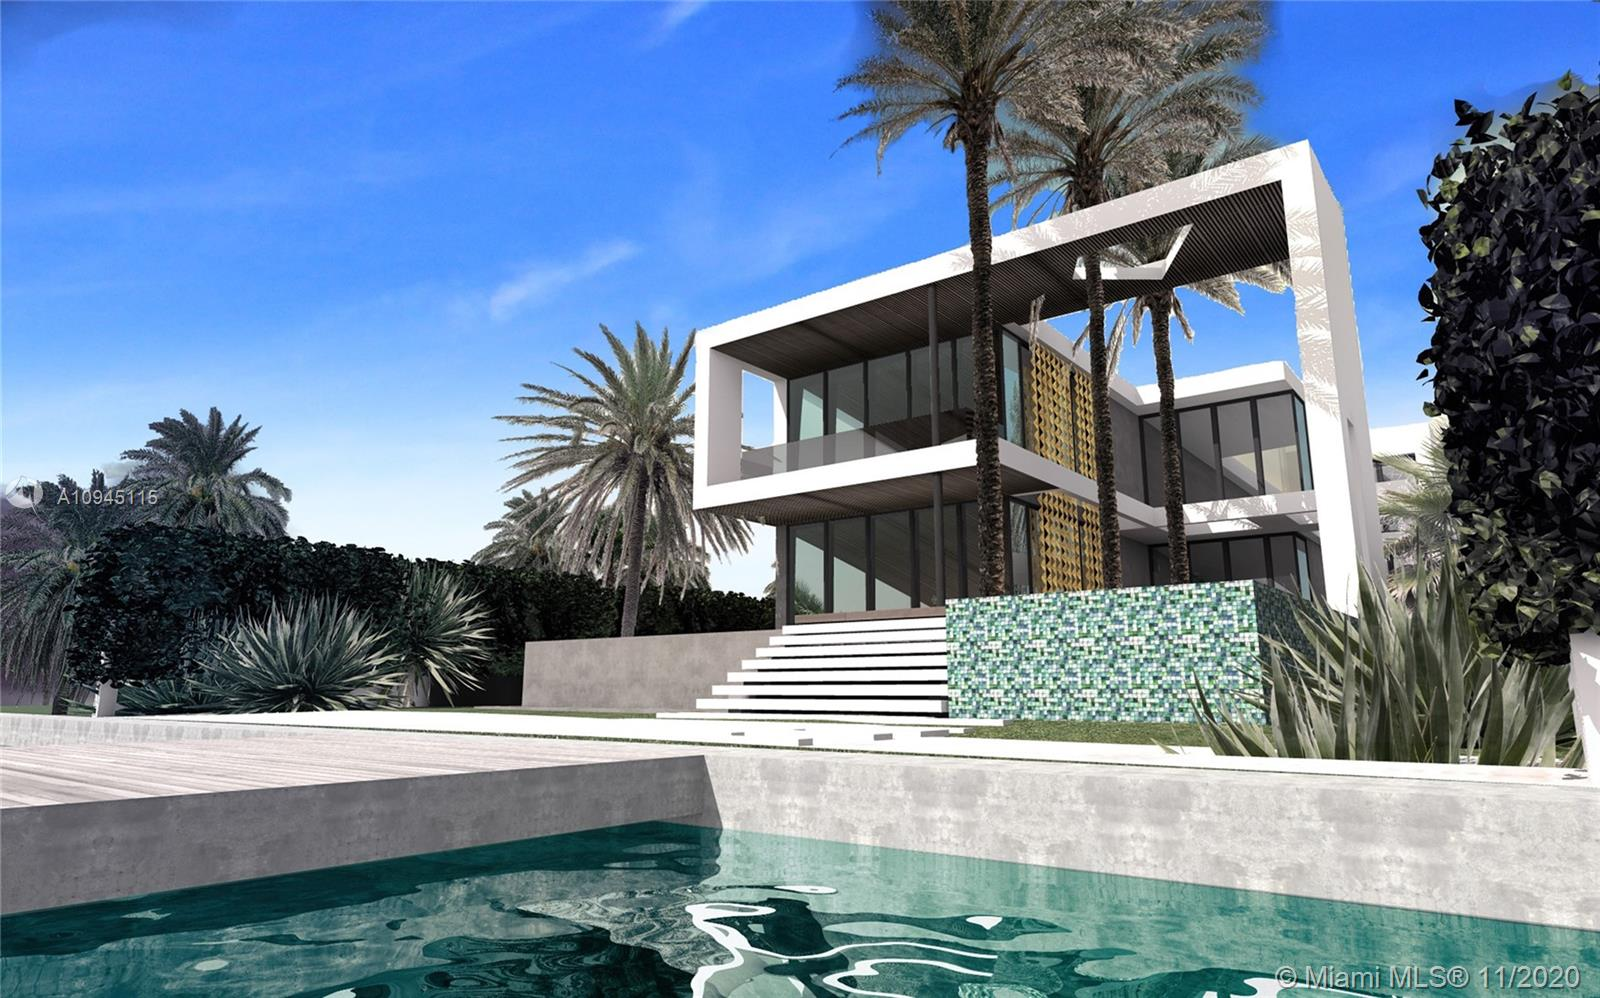 165 N Hibiscus Dr Luxury Real Estate